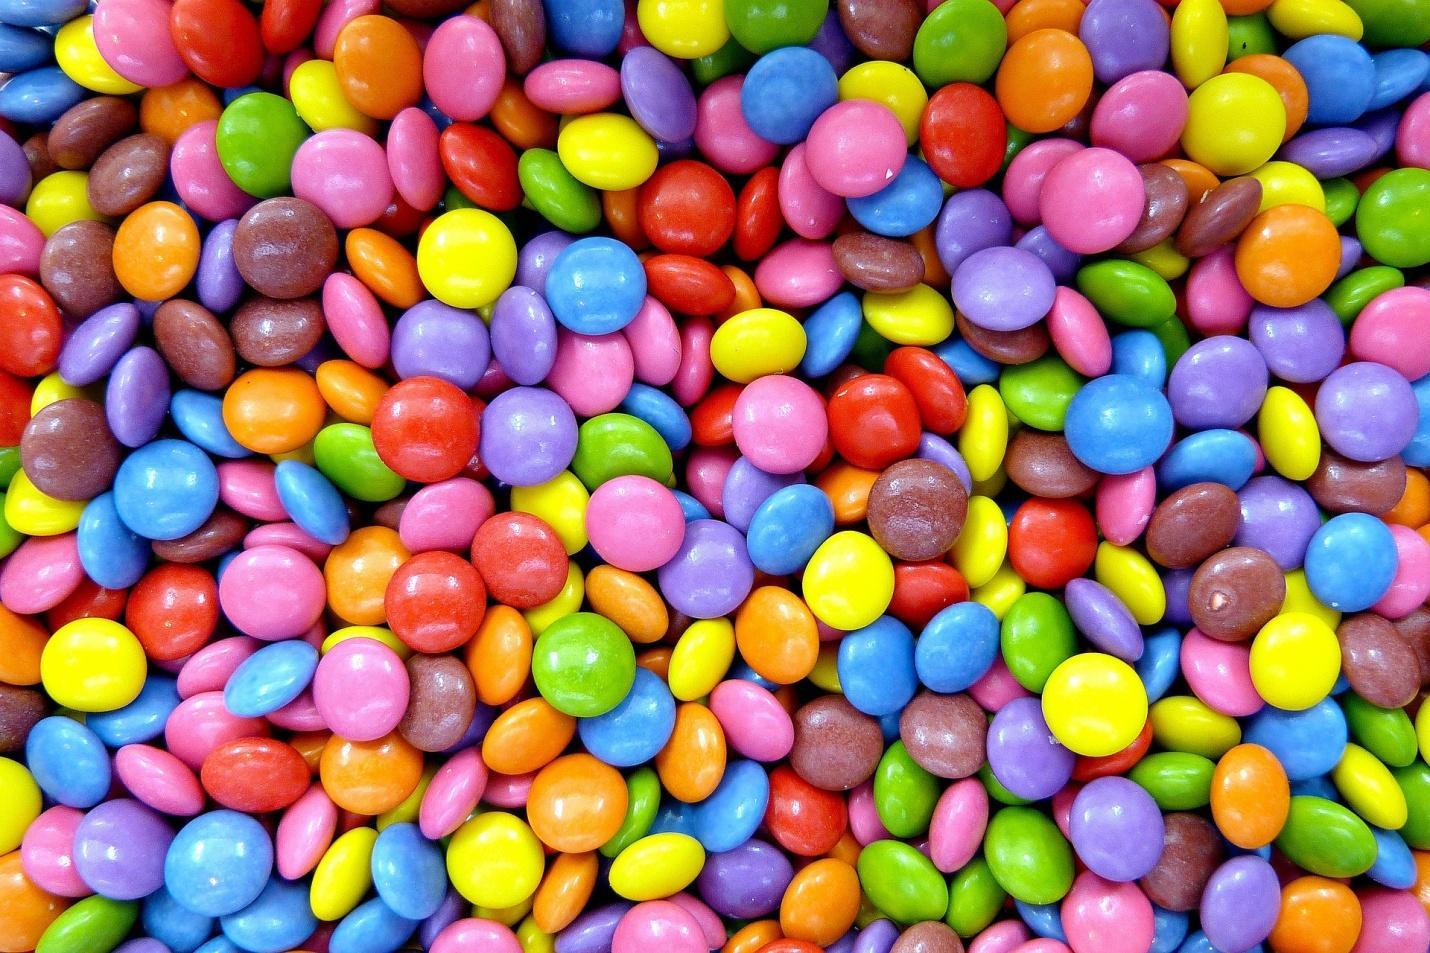 candy-50838_1920.jpg